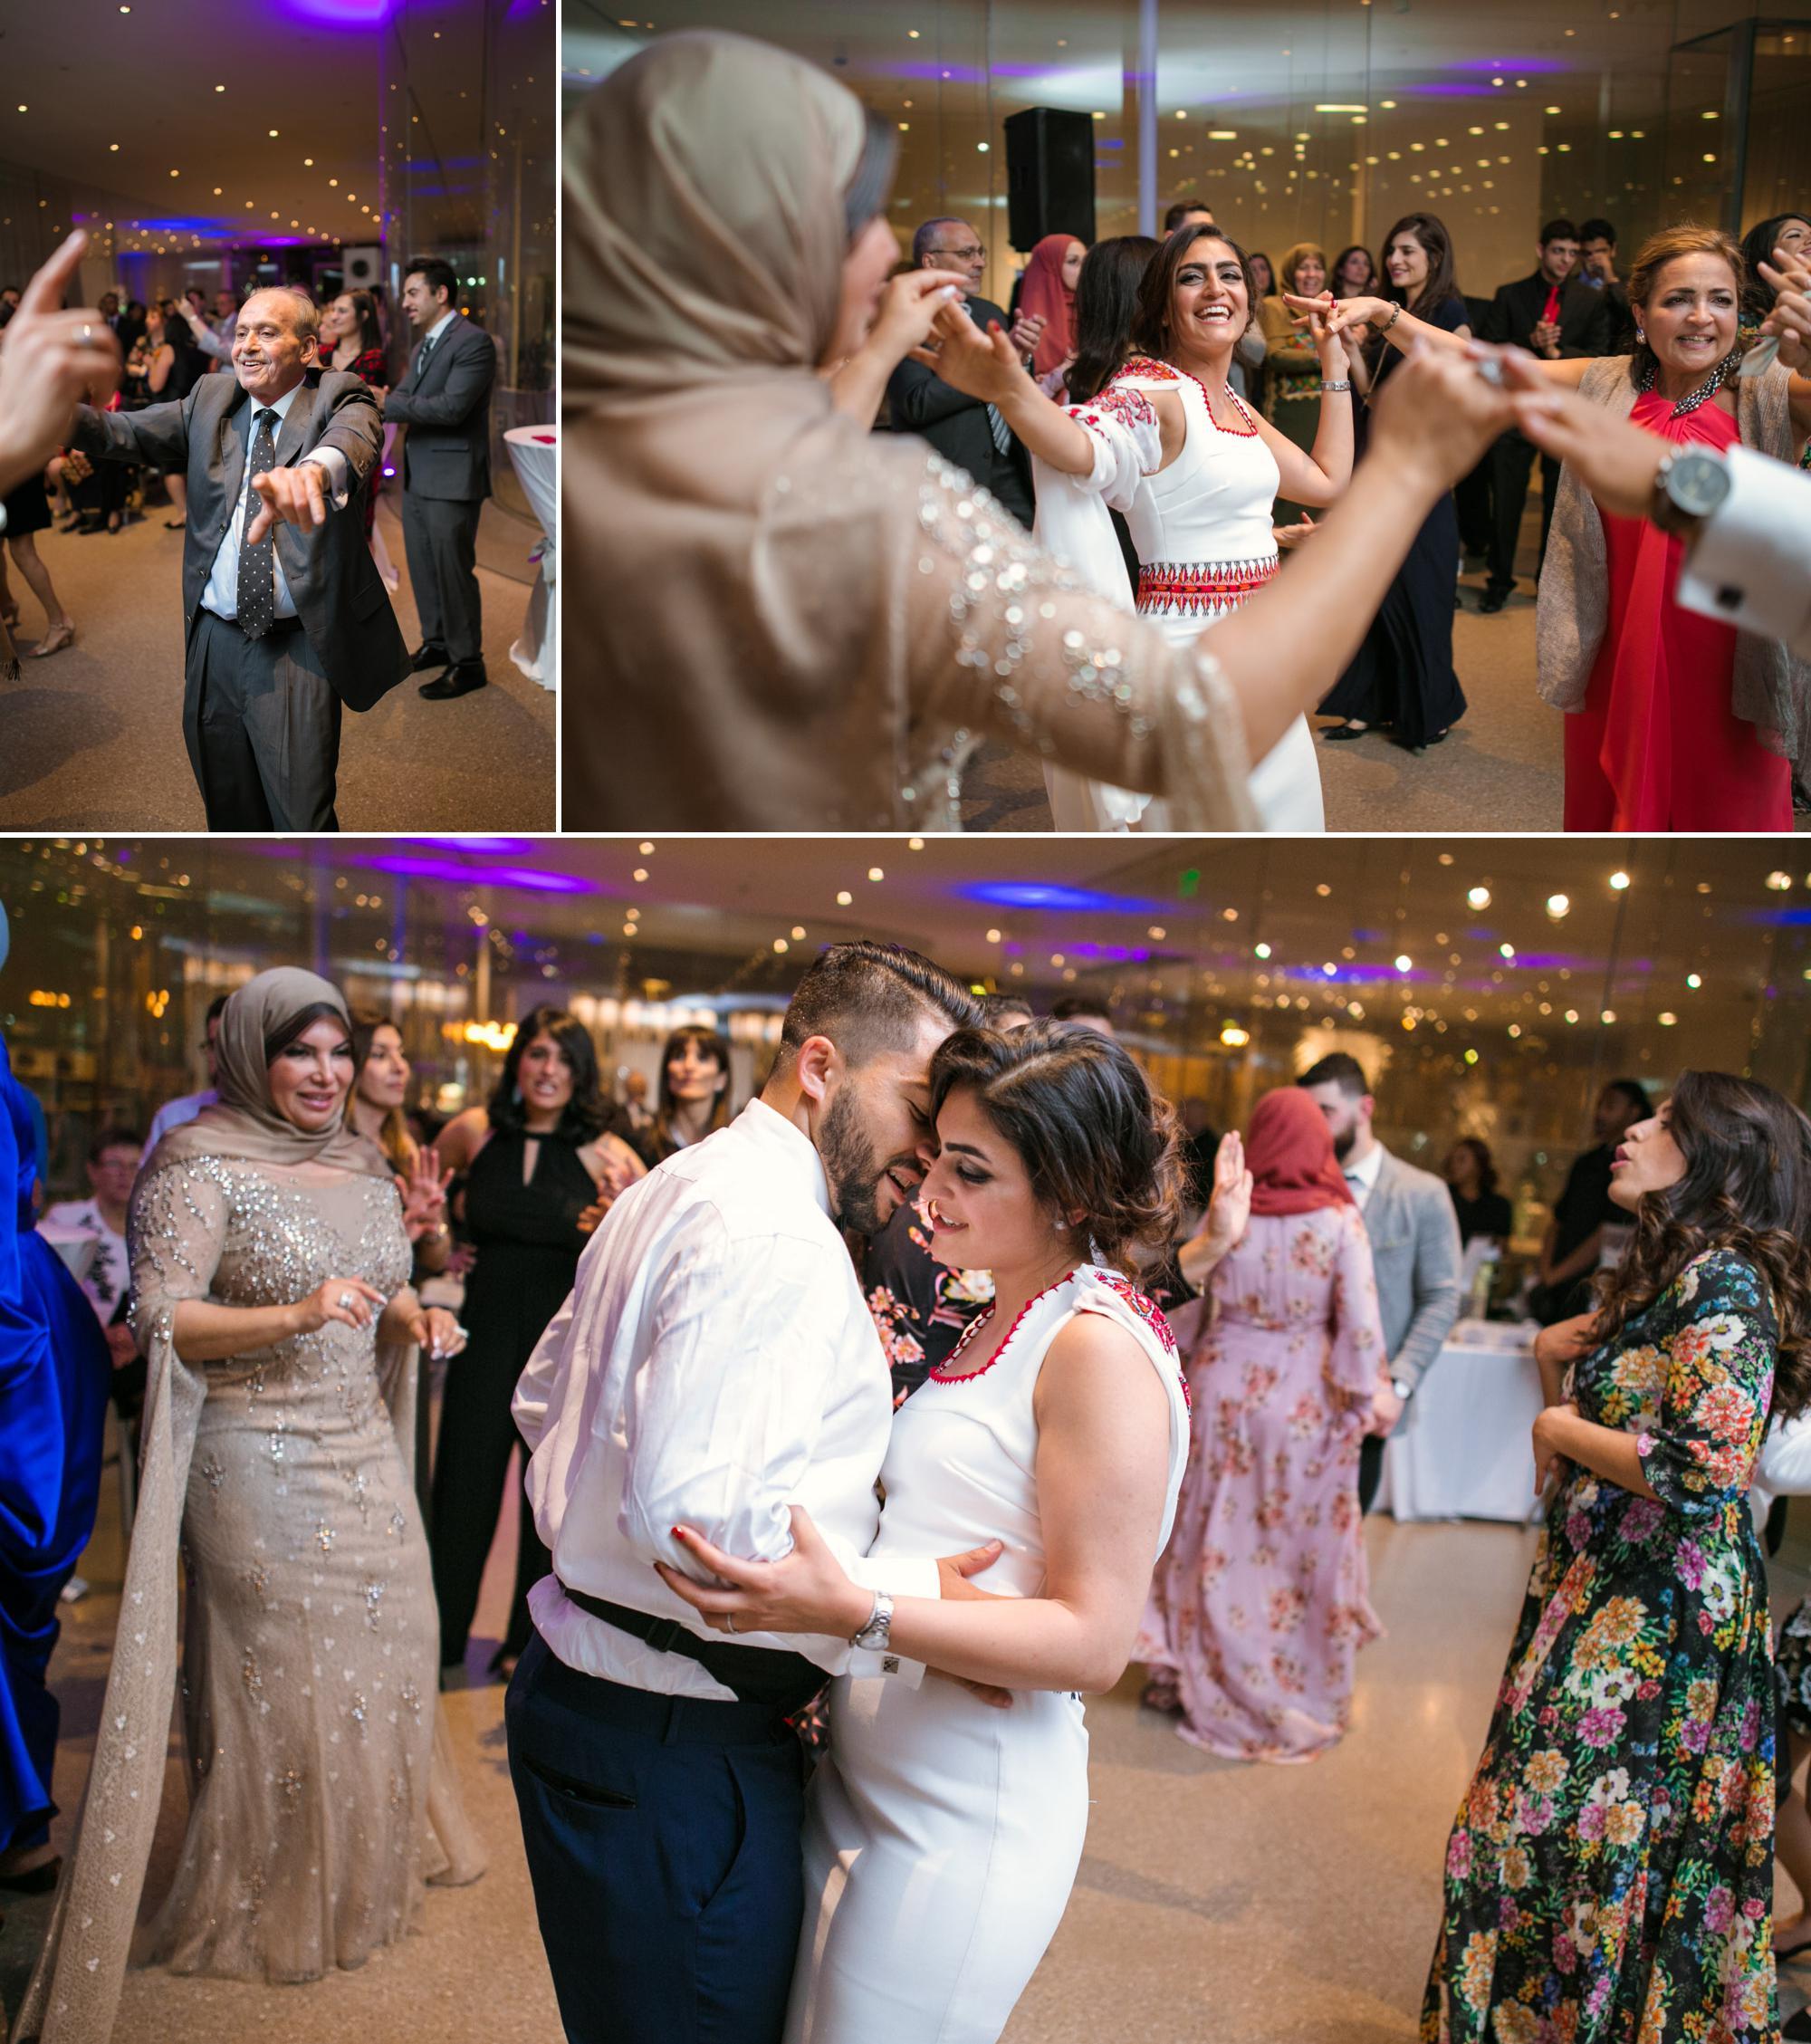 toledo-museum-glass-pavilion-wedding-photos-15.jpg